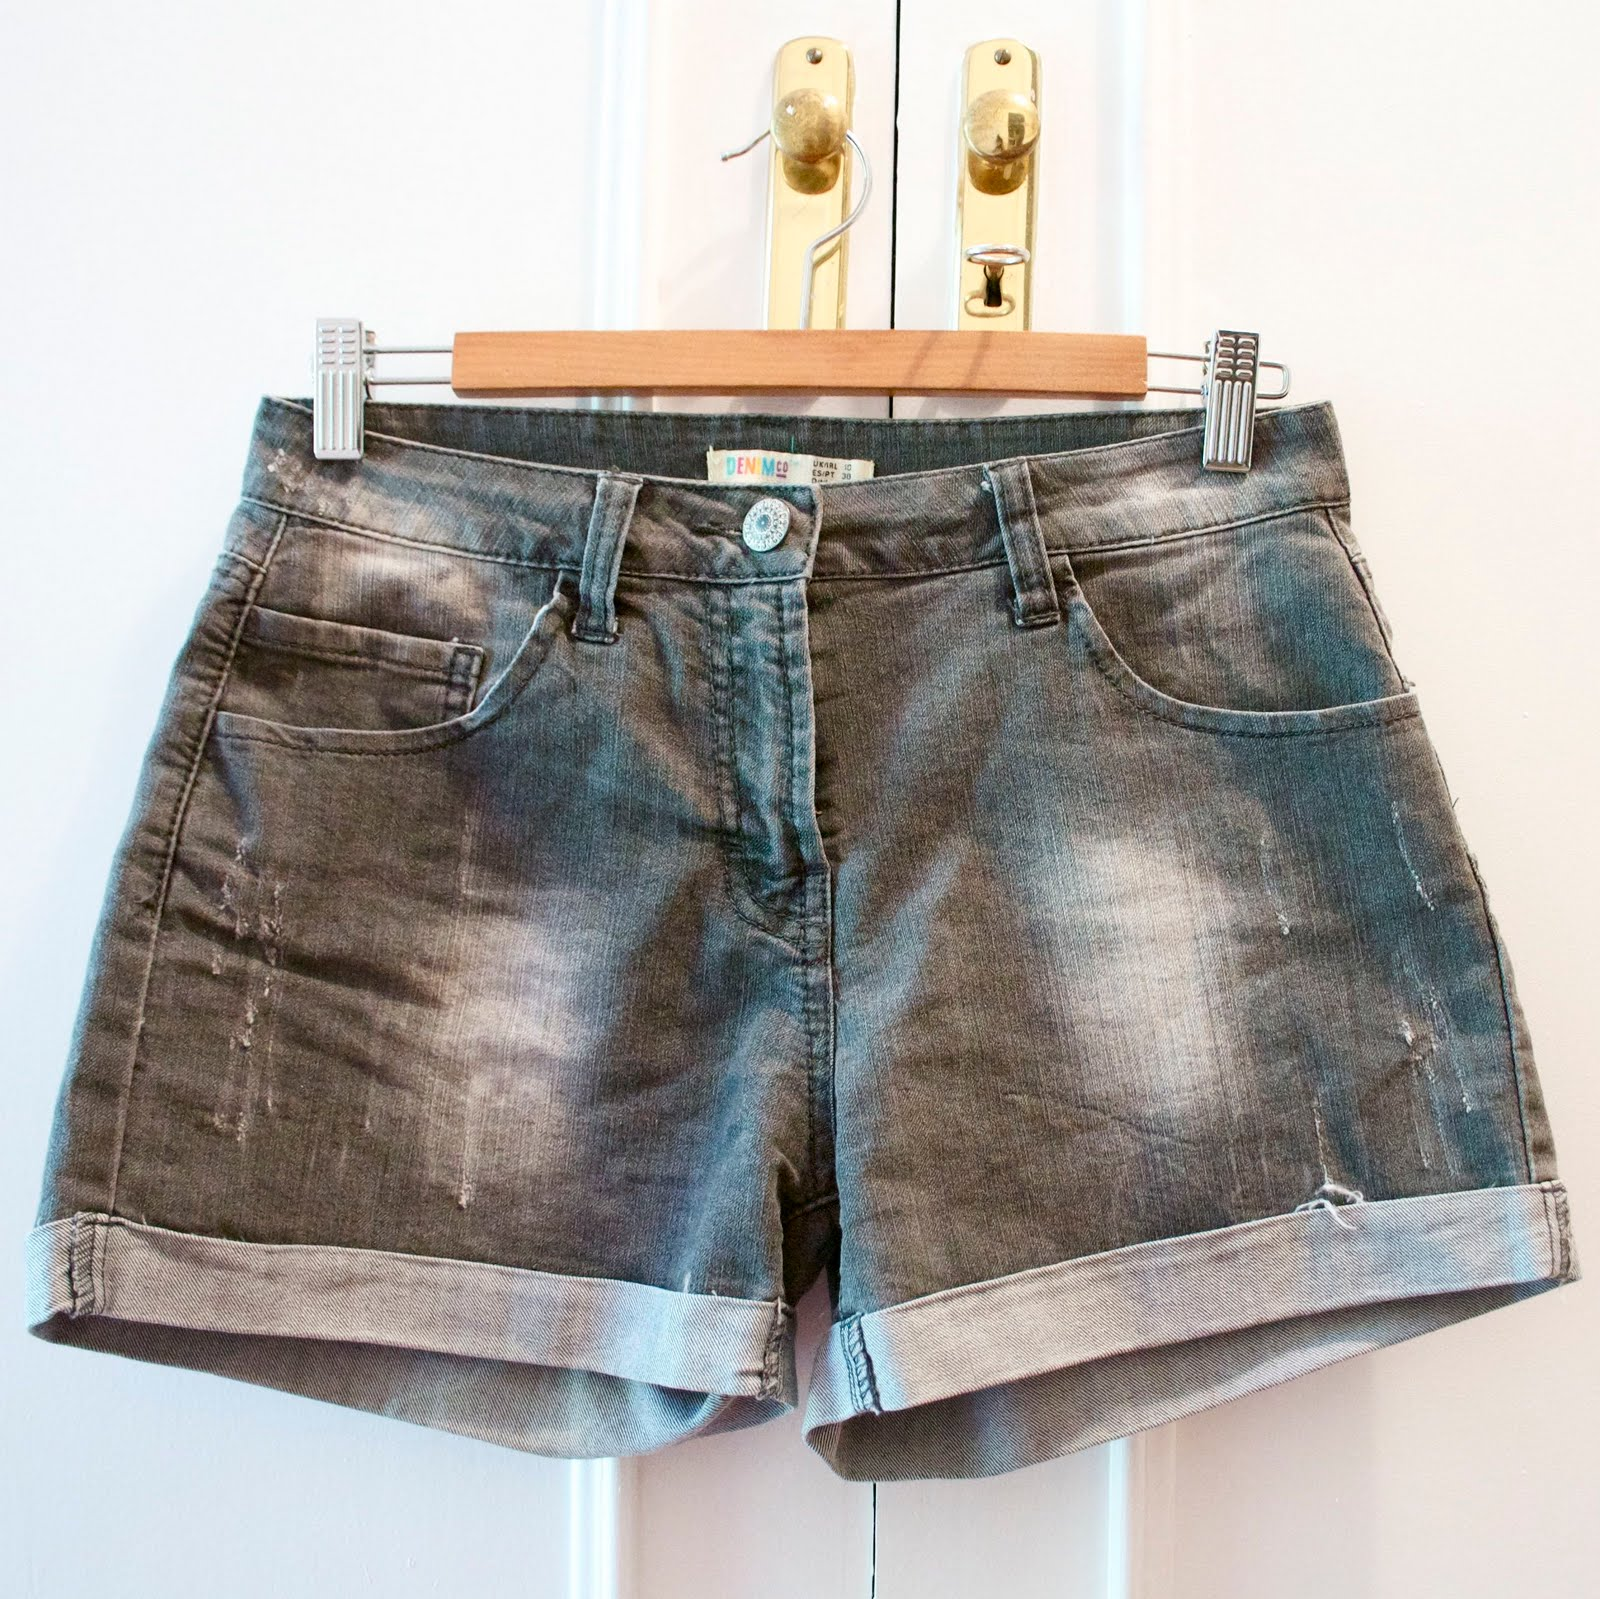 Cómo customizar unos shorts denim-222-crimenesdelamoda